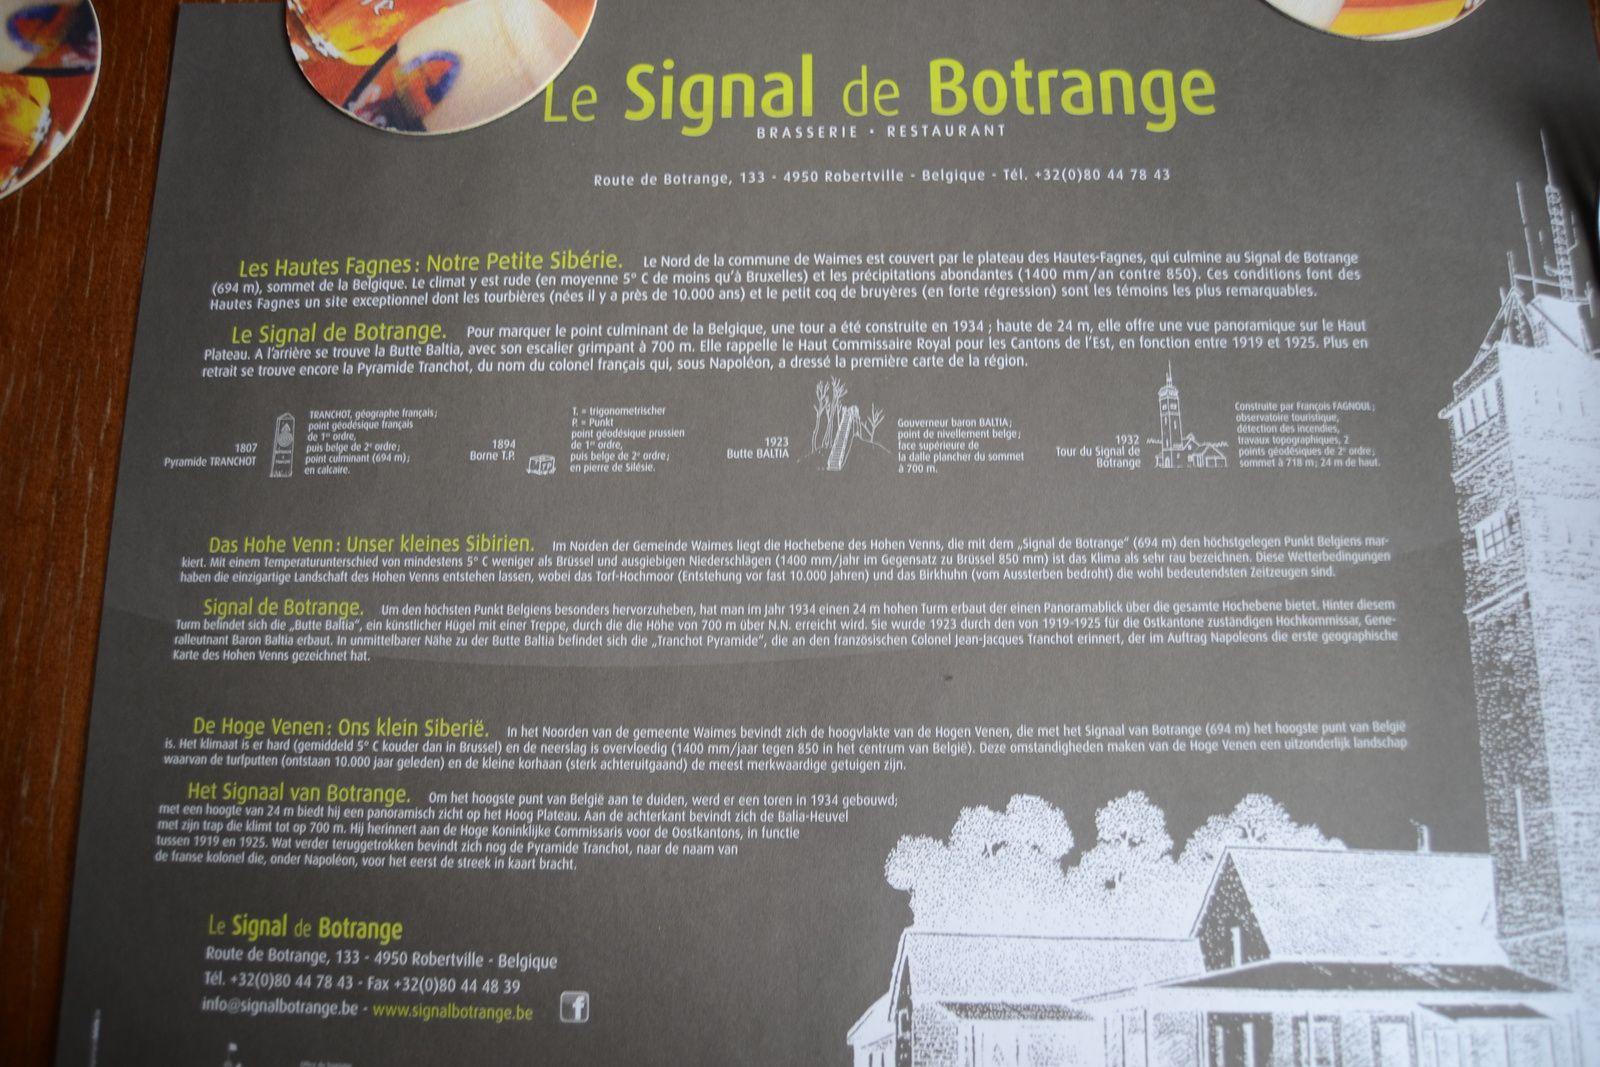 Le Signal de Botrange 21/04/2014